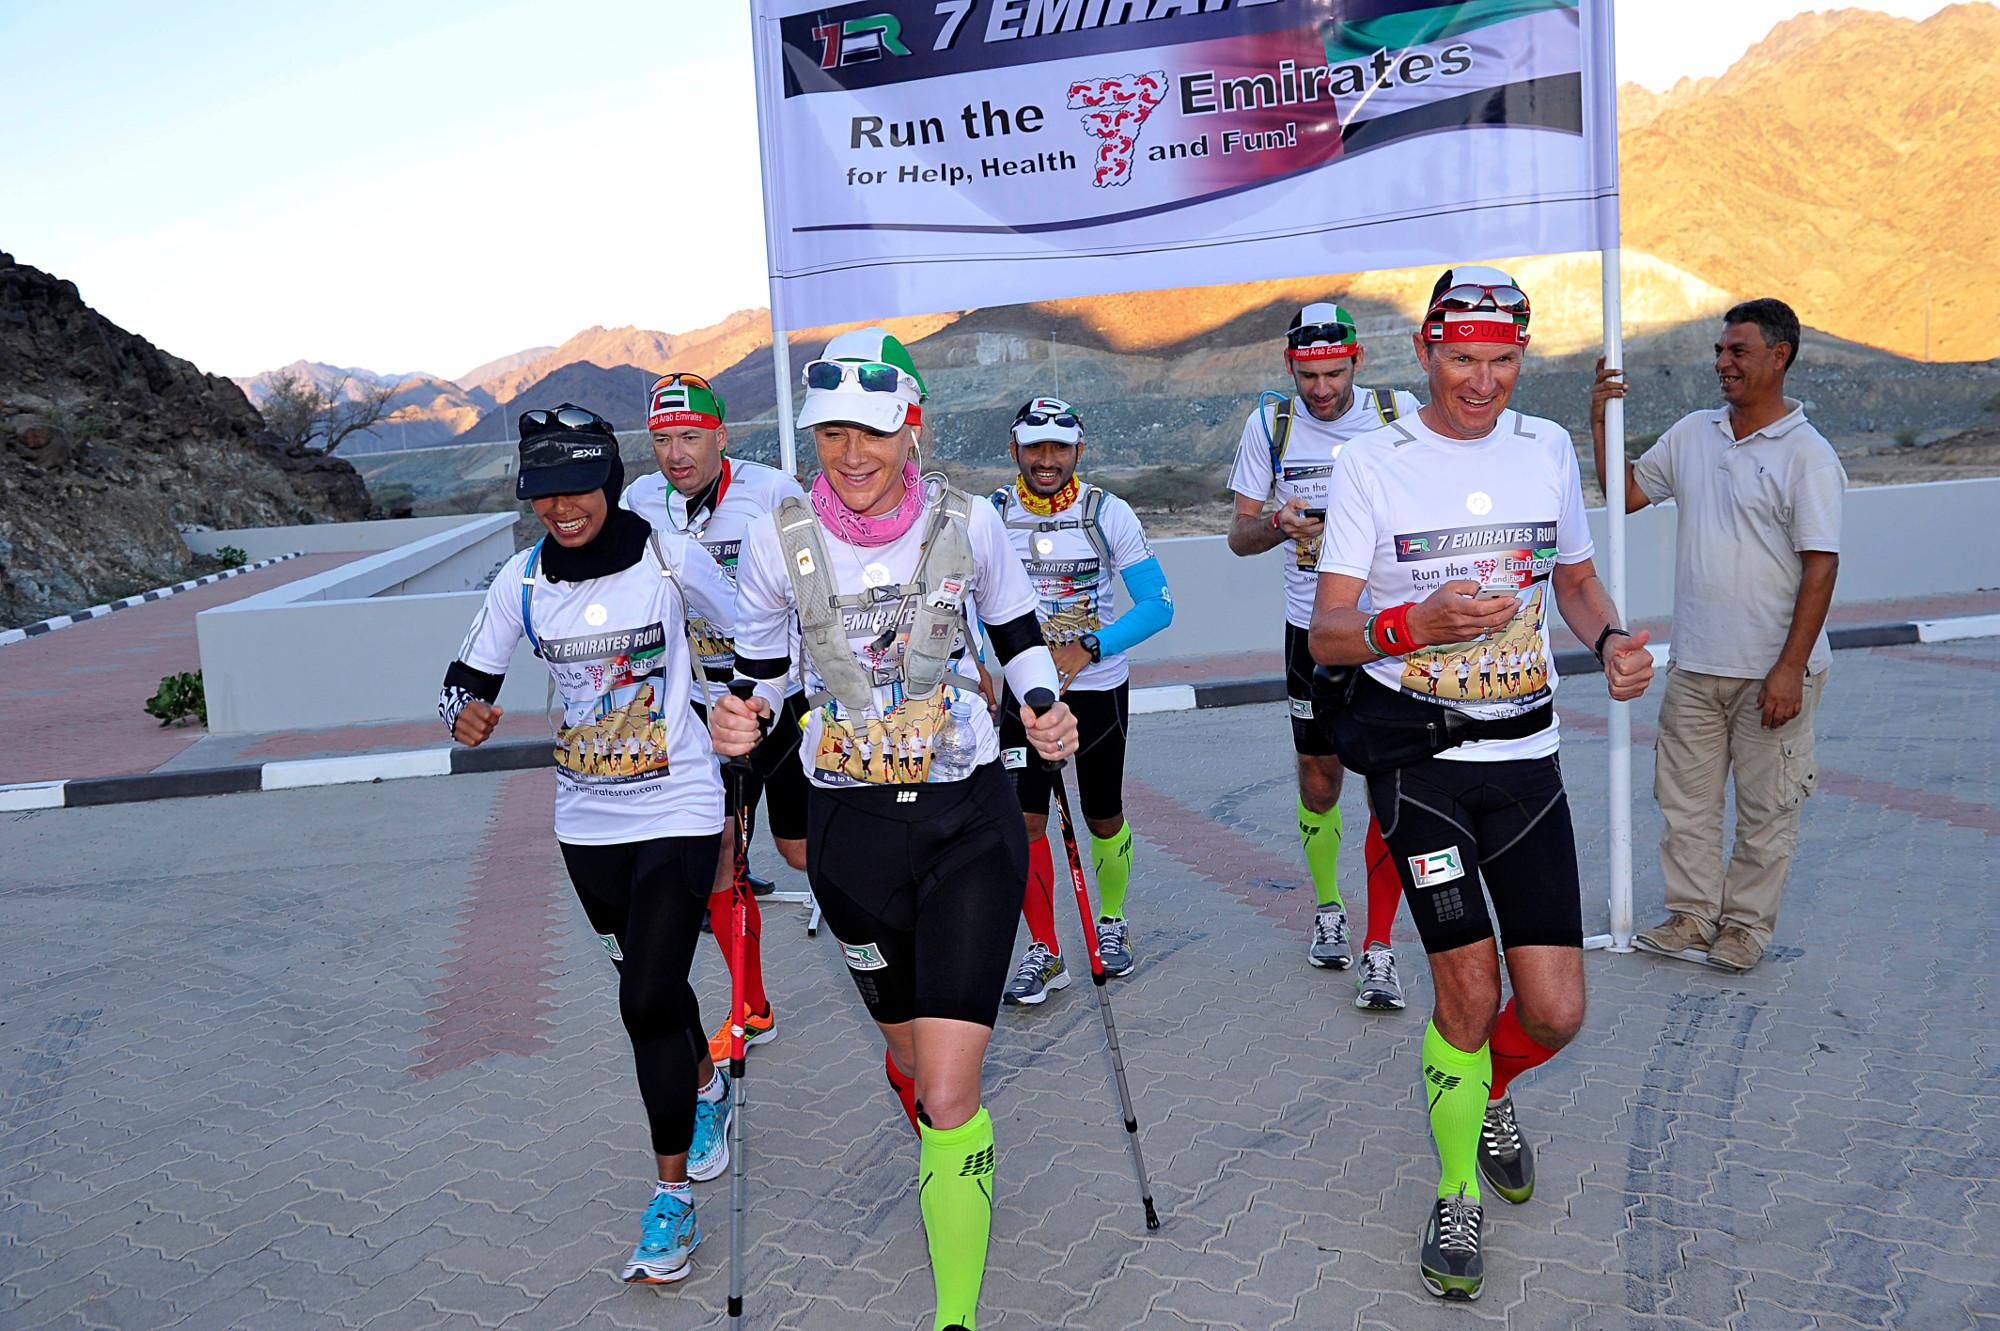 The Run 2013 7emiratesrun